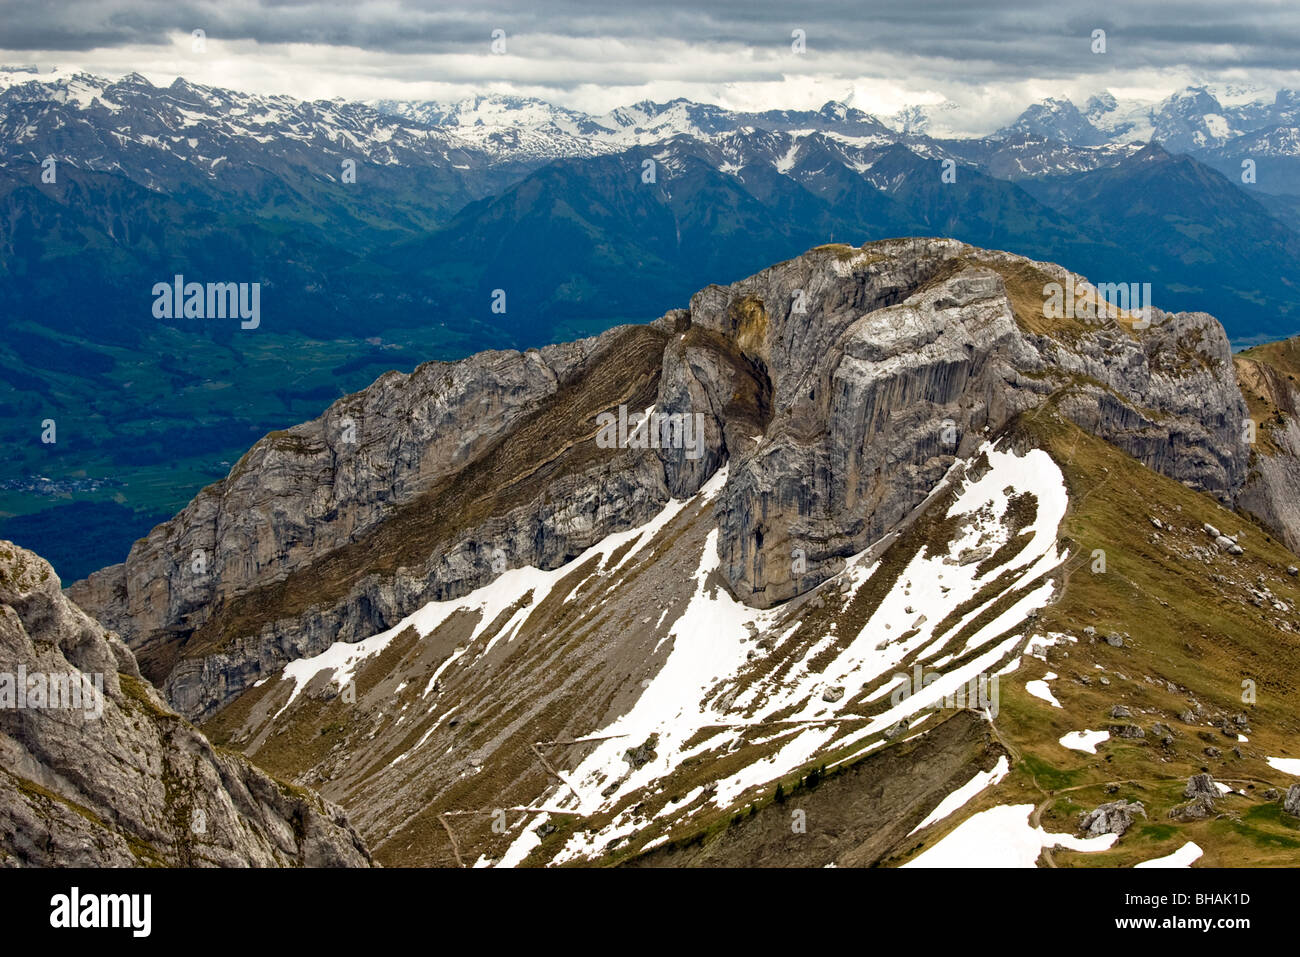 Mount Pilatus Switzerland. Stock Photo